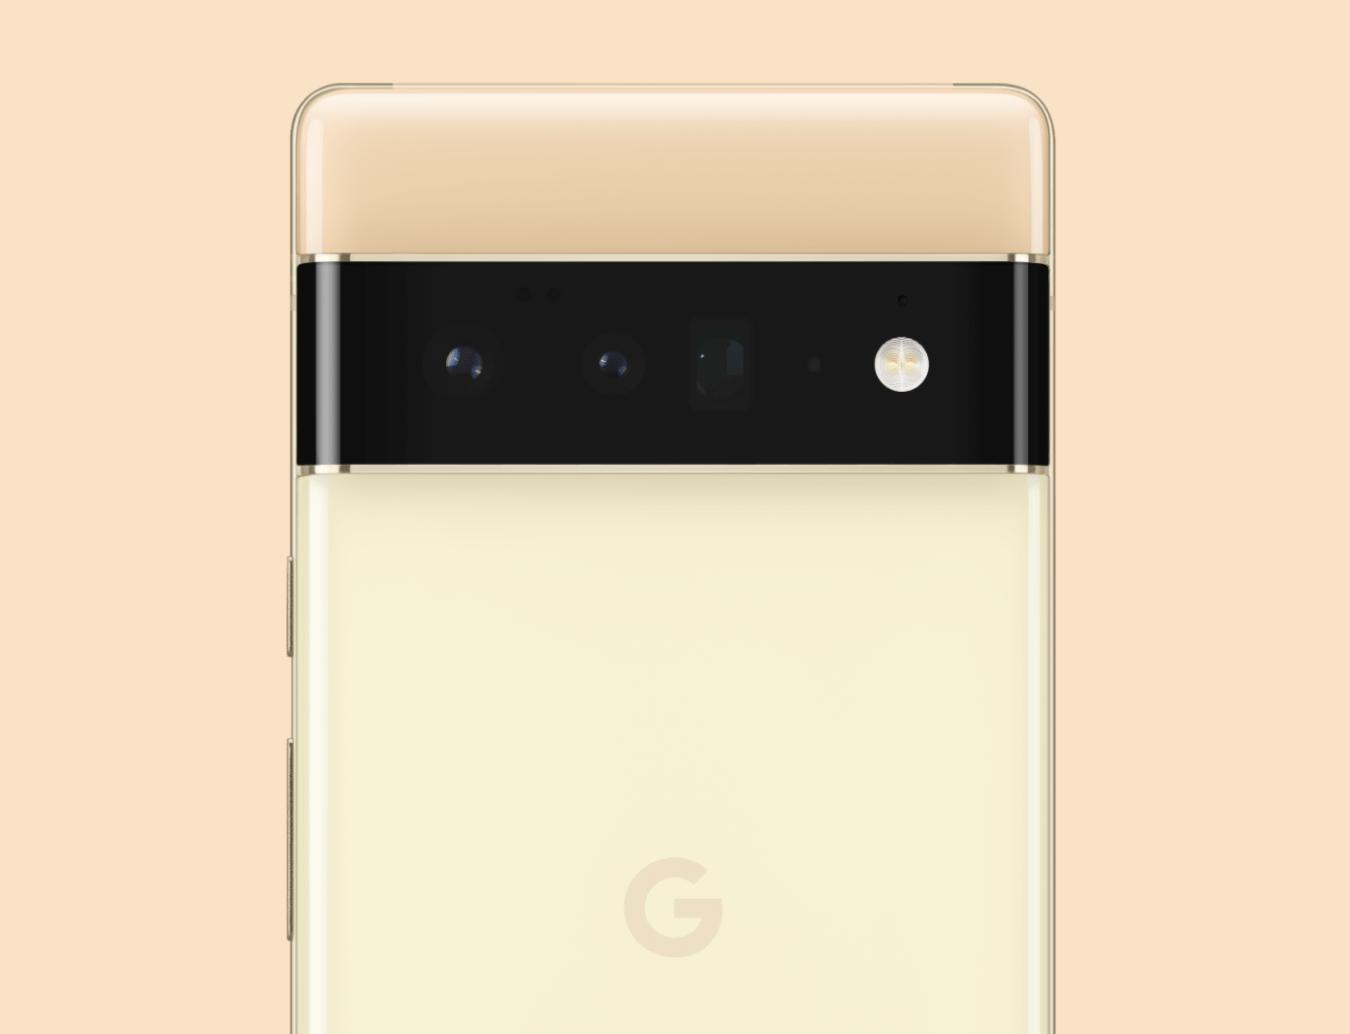 Google Pixel 6 Pro In-display Fingerprint Sensor Screenshot